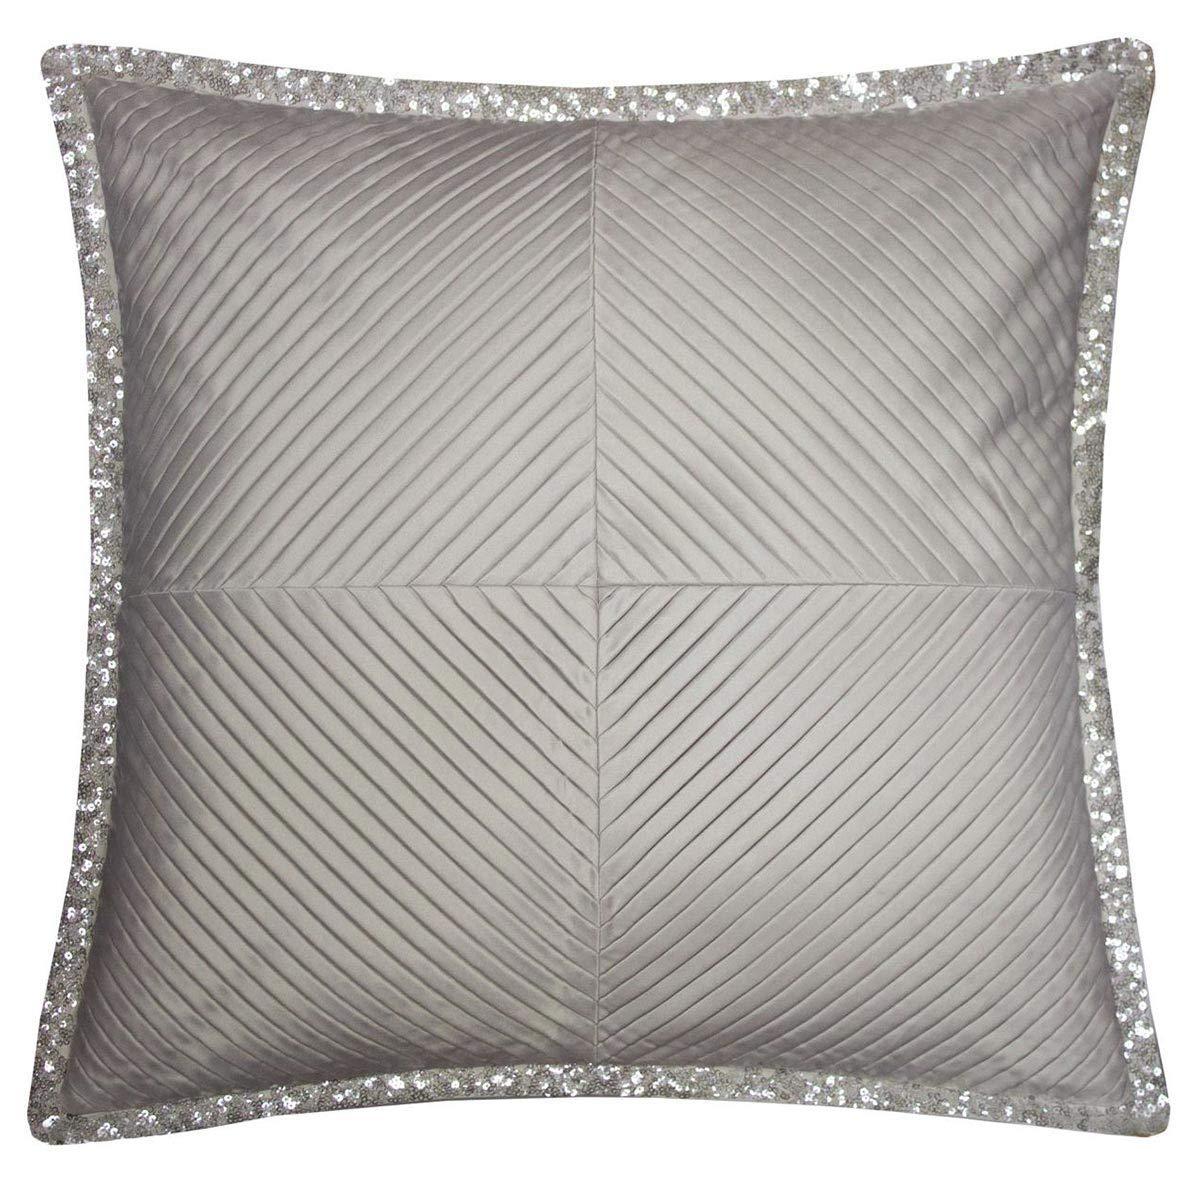 Zina Praline Cushion Matching Accessories Kylie at Home 45x45cm